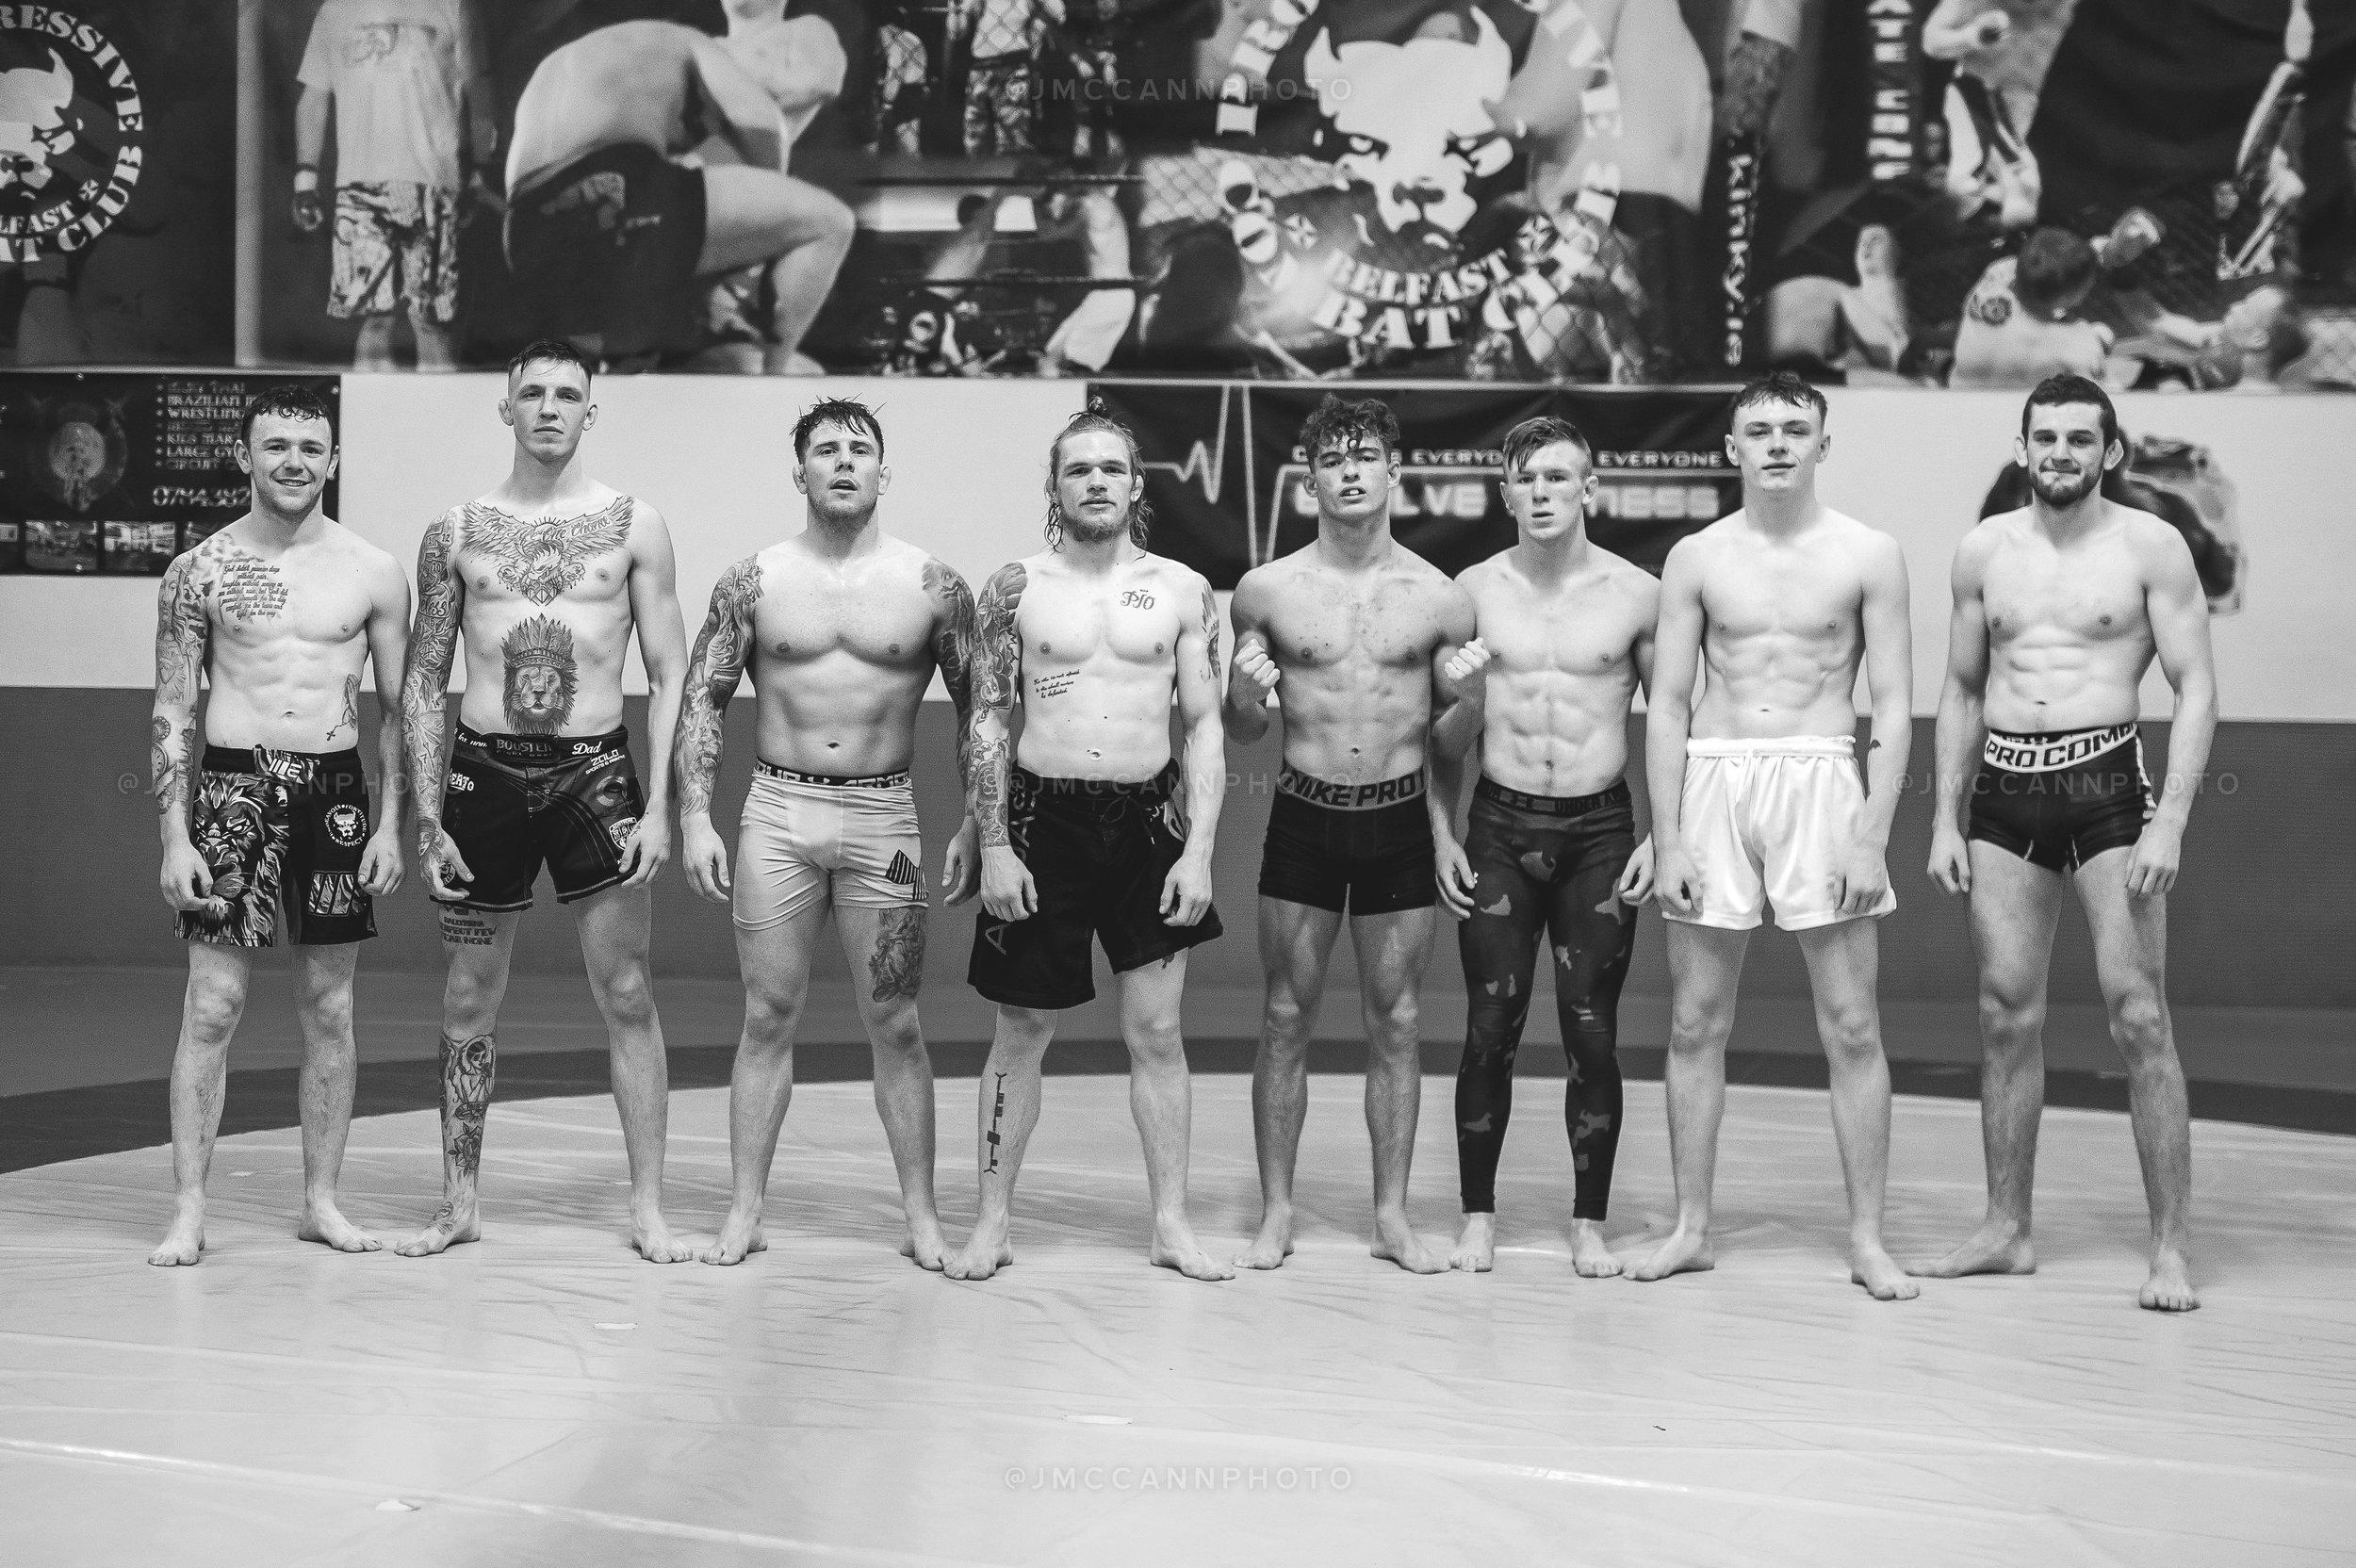 After sparring with (L-R) James McErlean, Patrick McAlister, Decky Dalton, Glenn McVeigh, Matthew Elliott, Garrett Smylie, and Joe McColgan.